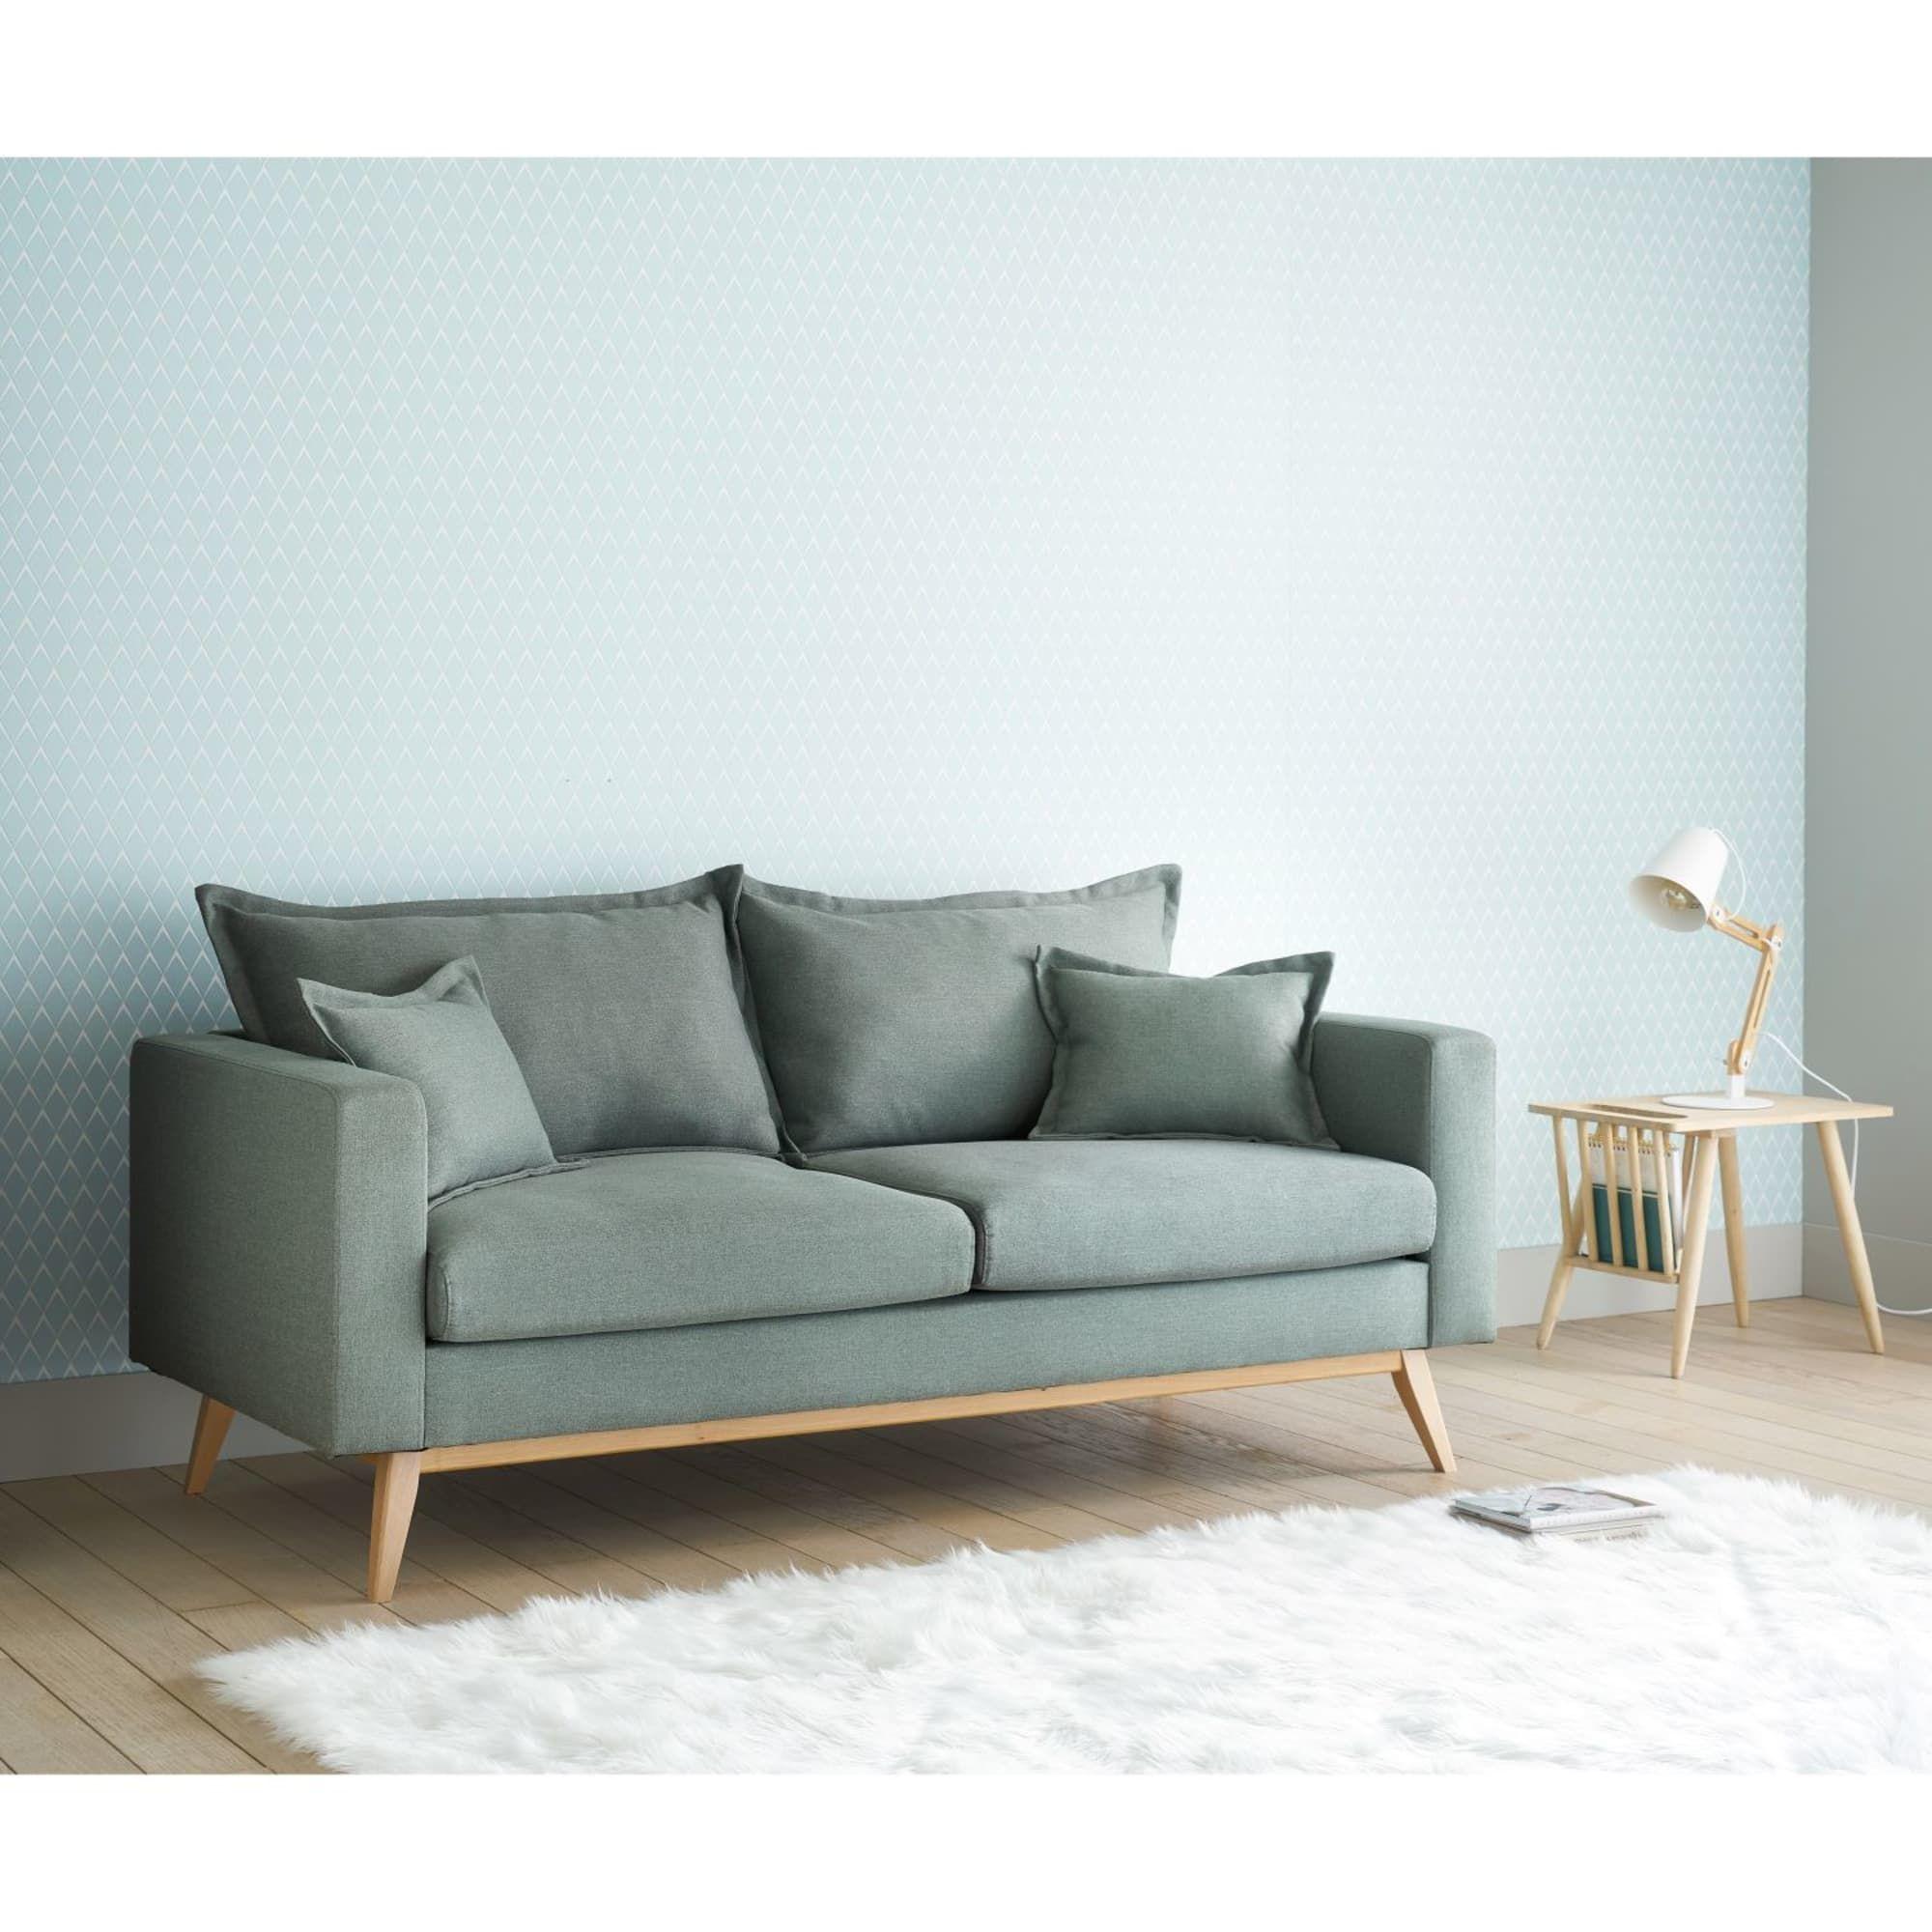 Ausziehbares 3 Sitzer Sofa Aus Stoff Hellgrau In 2020 Vintage Sofa Sofa Bed Sofa